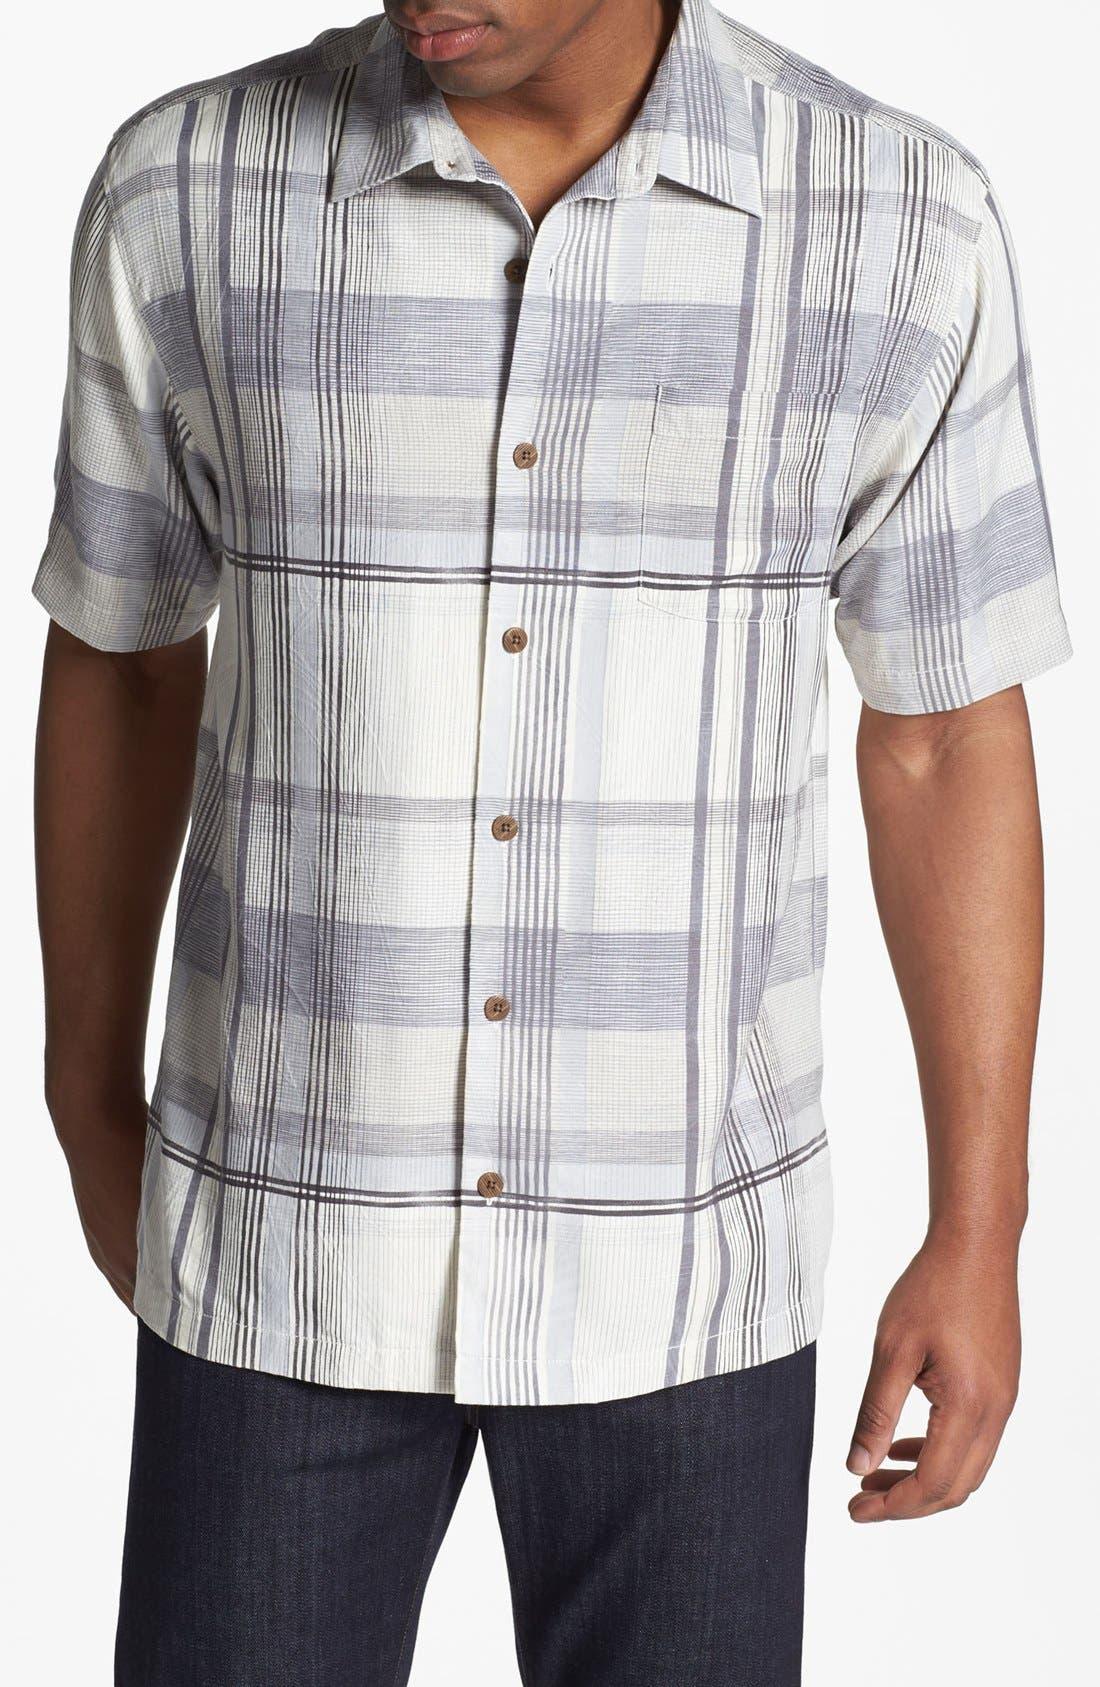 Alternate Image 1 Selected - Tommy Bahama 'Plaid Vallarta' Silk Campshirt